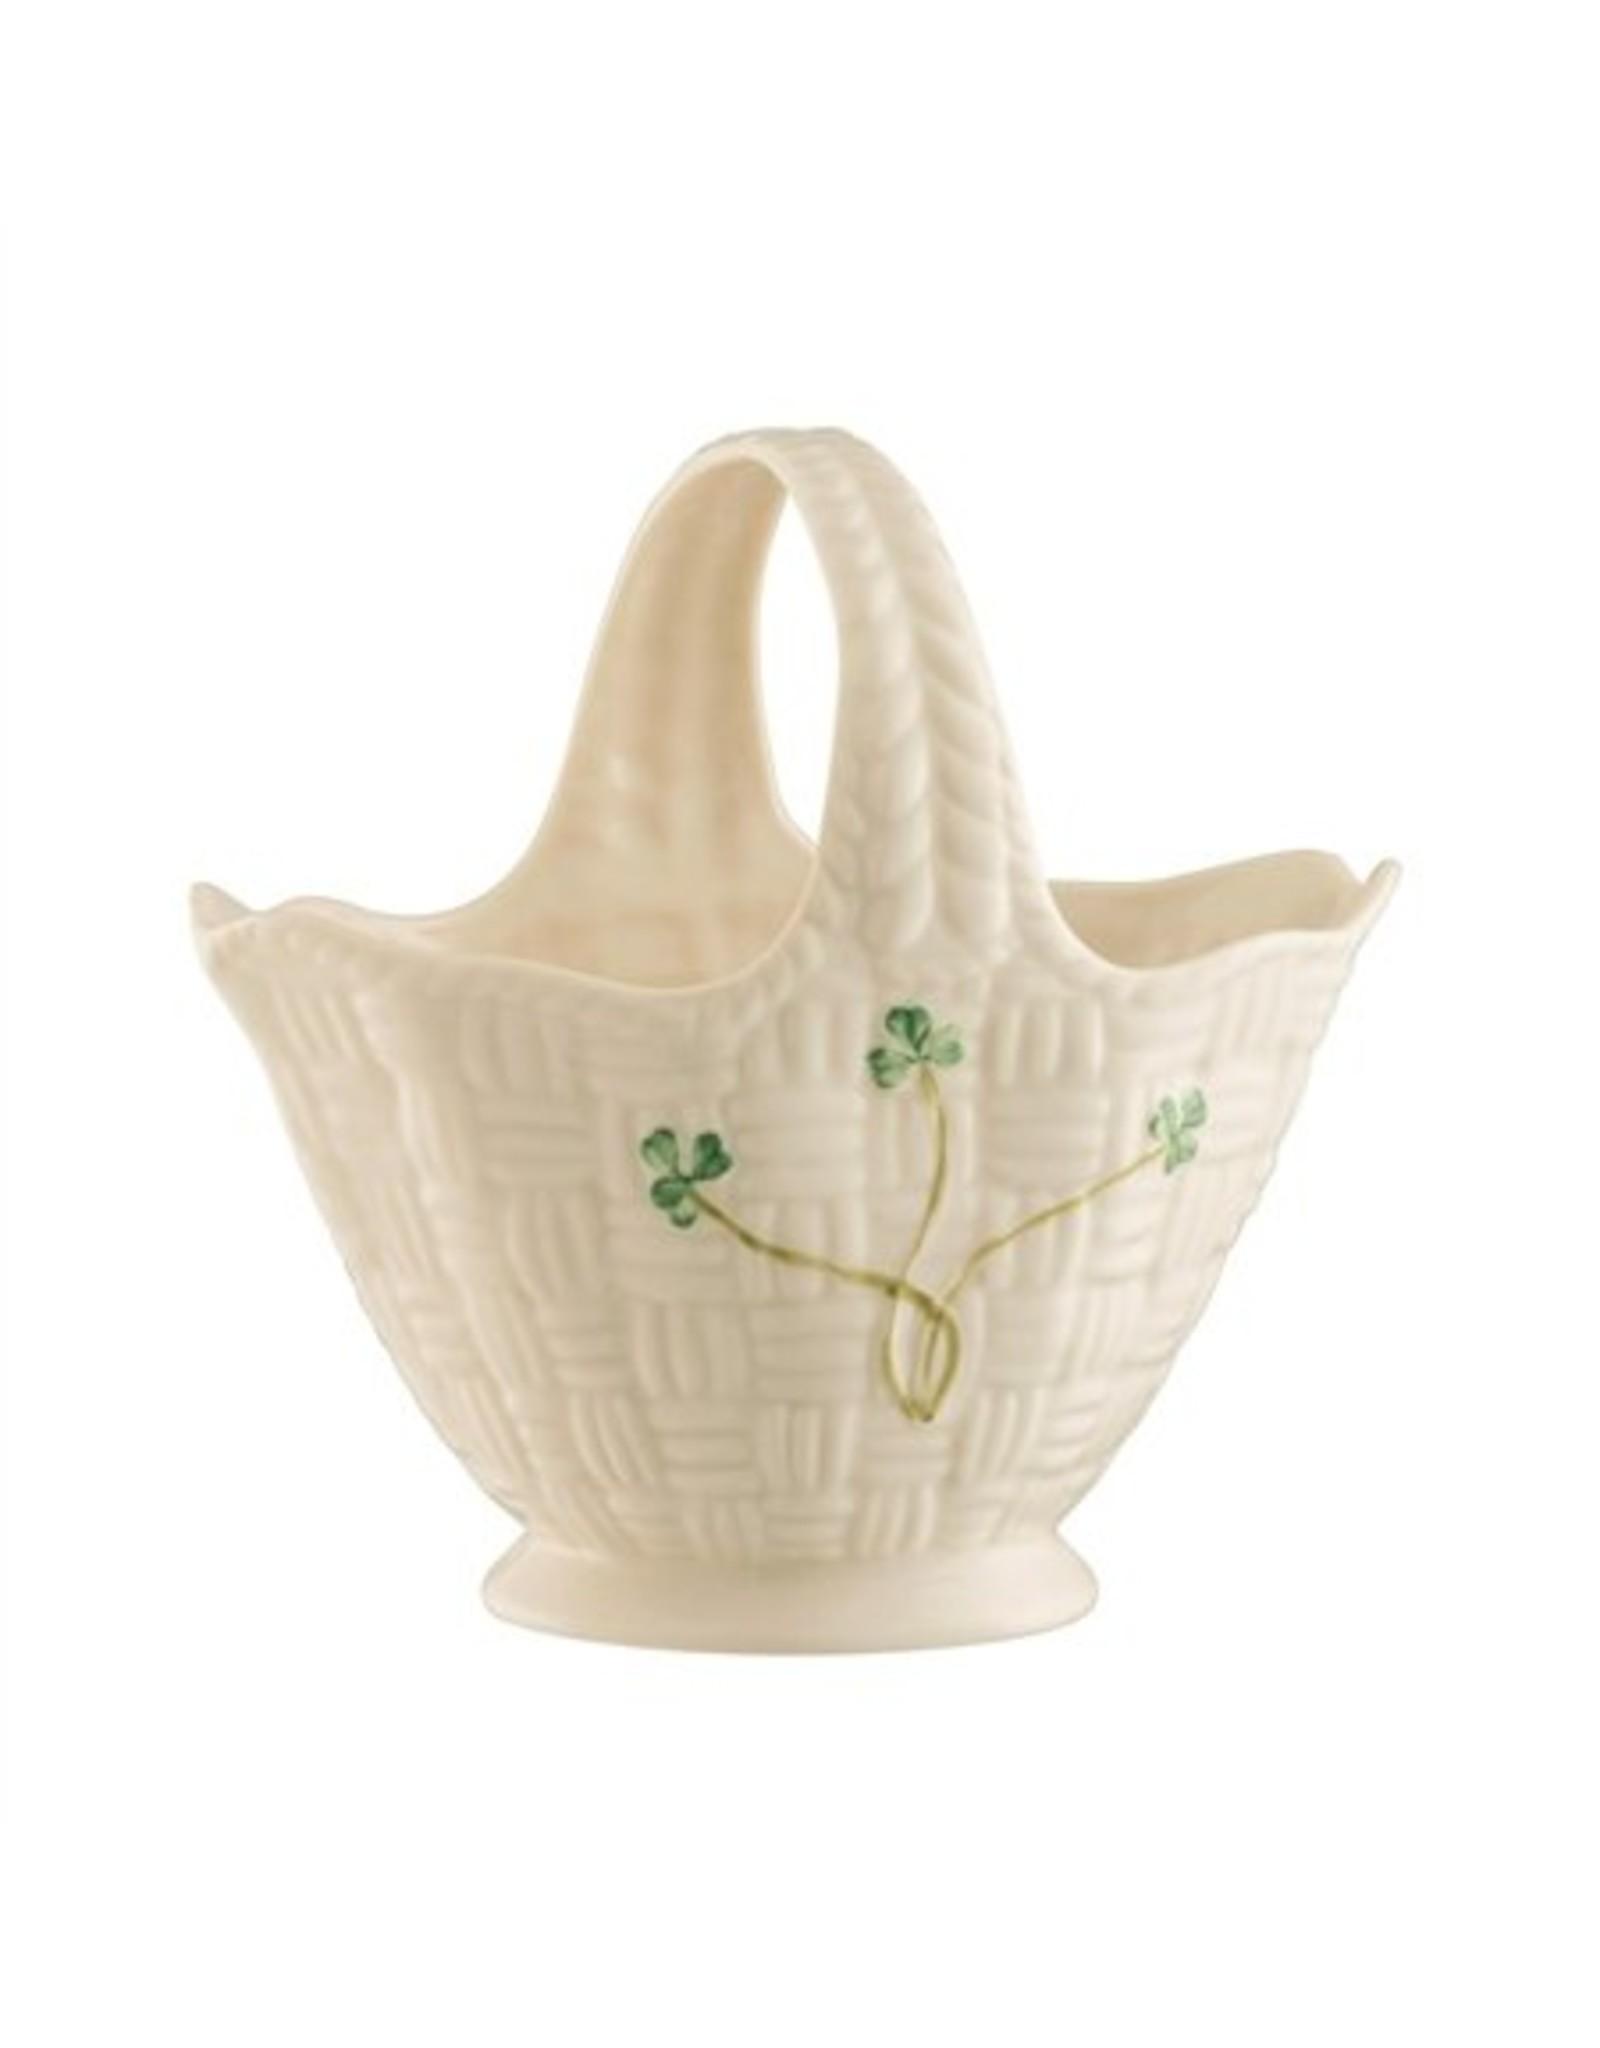 Belleek Belleek Shamrock Handled Basket